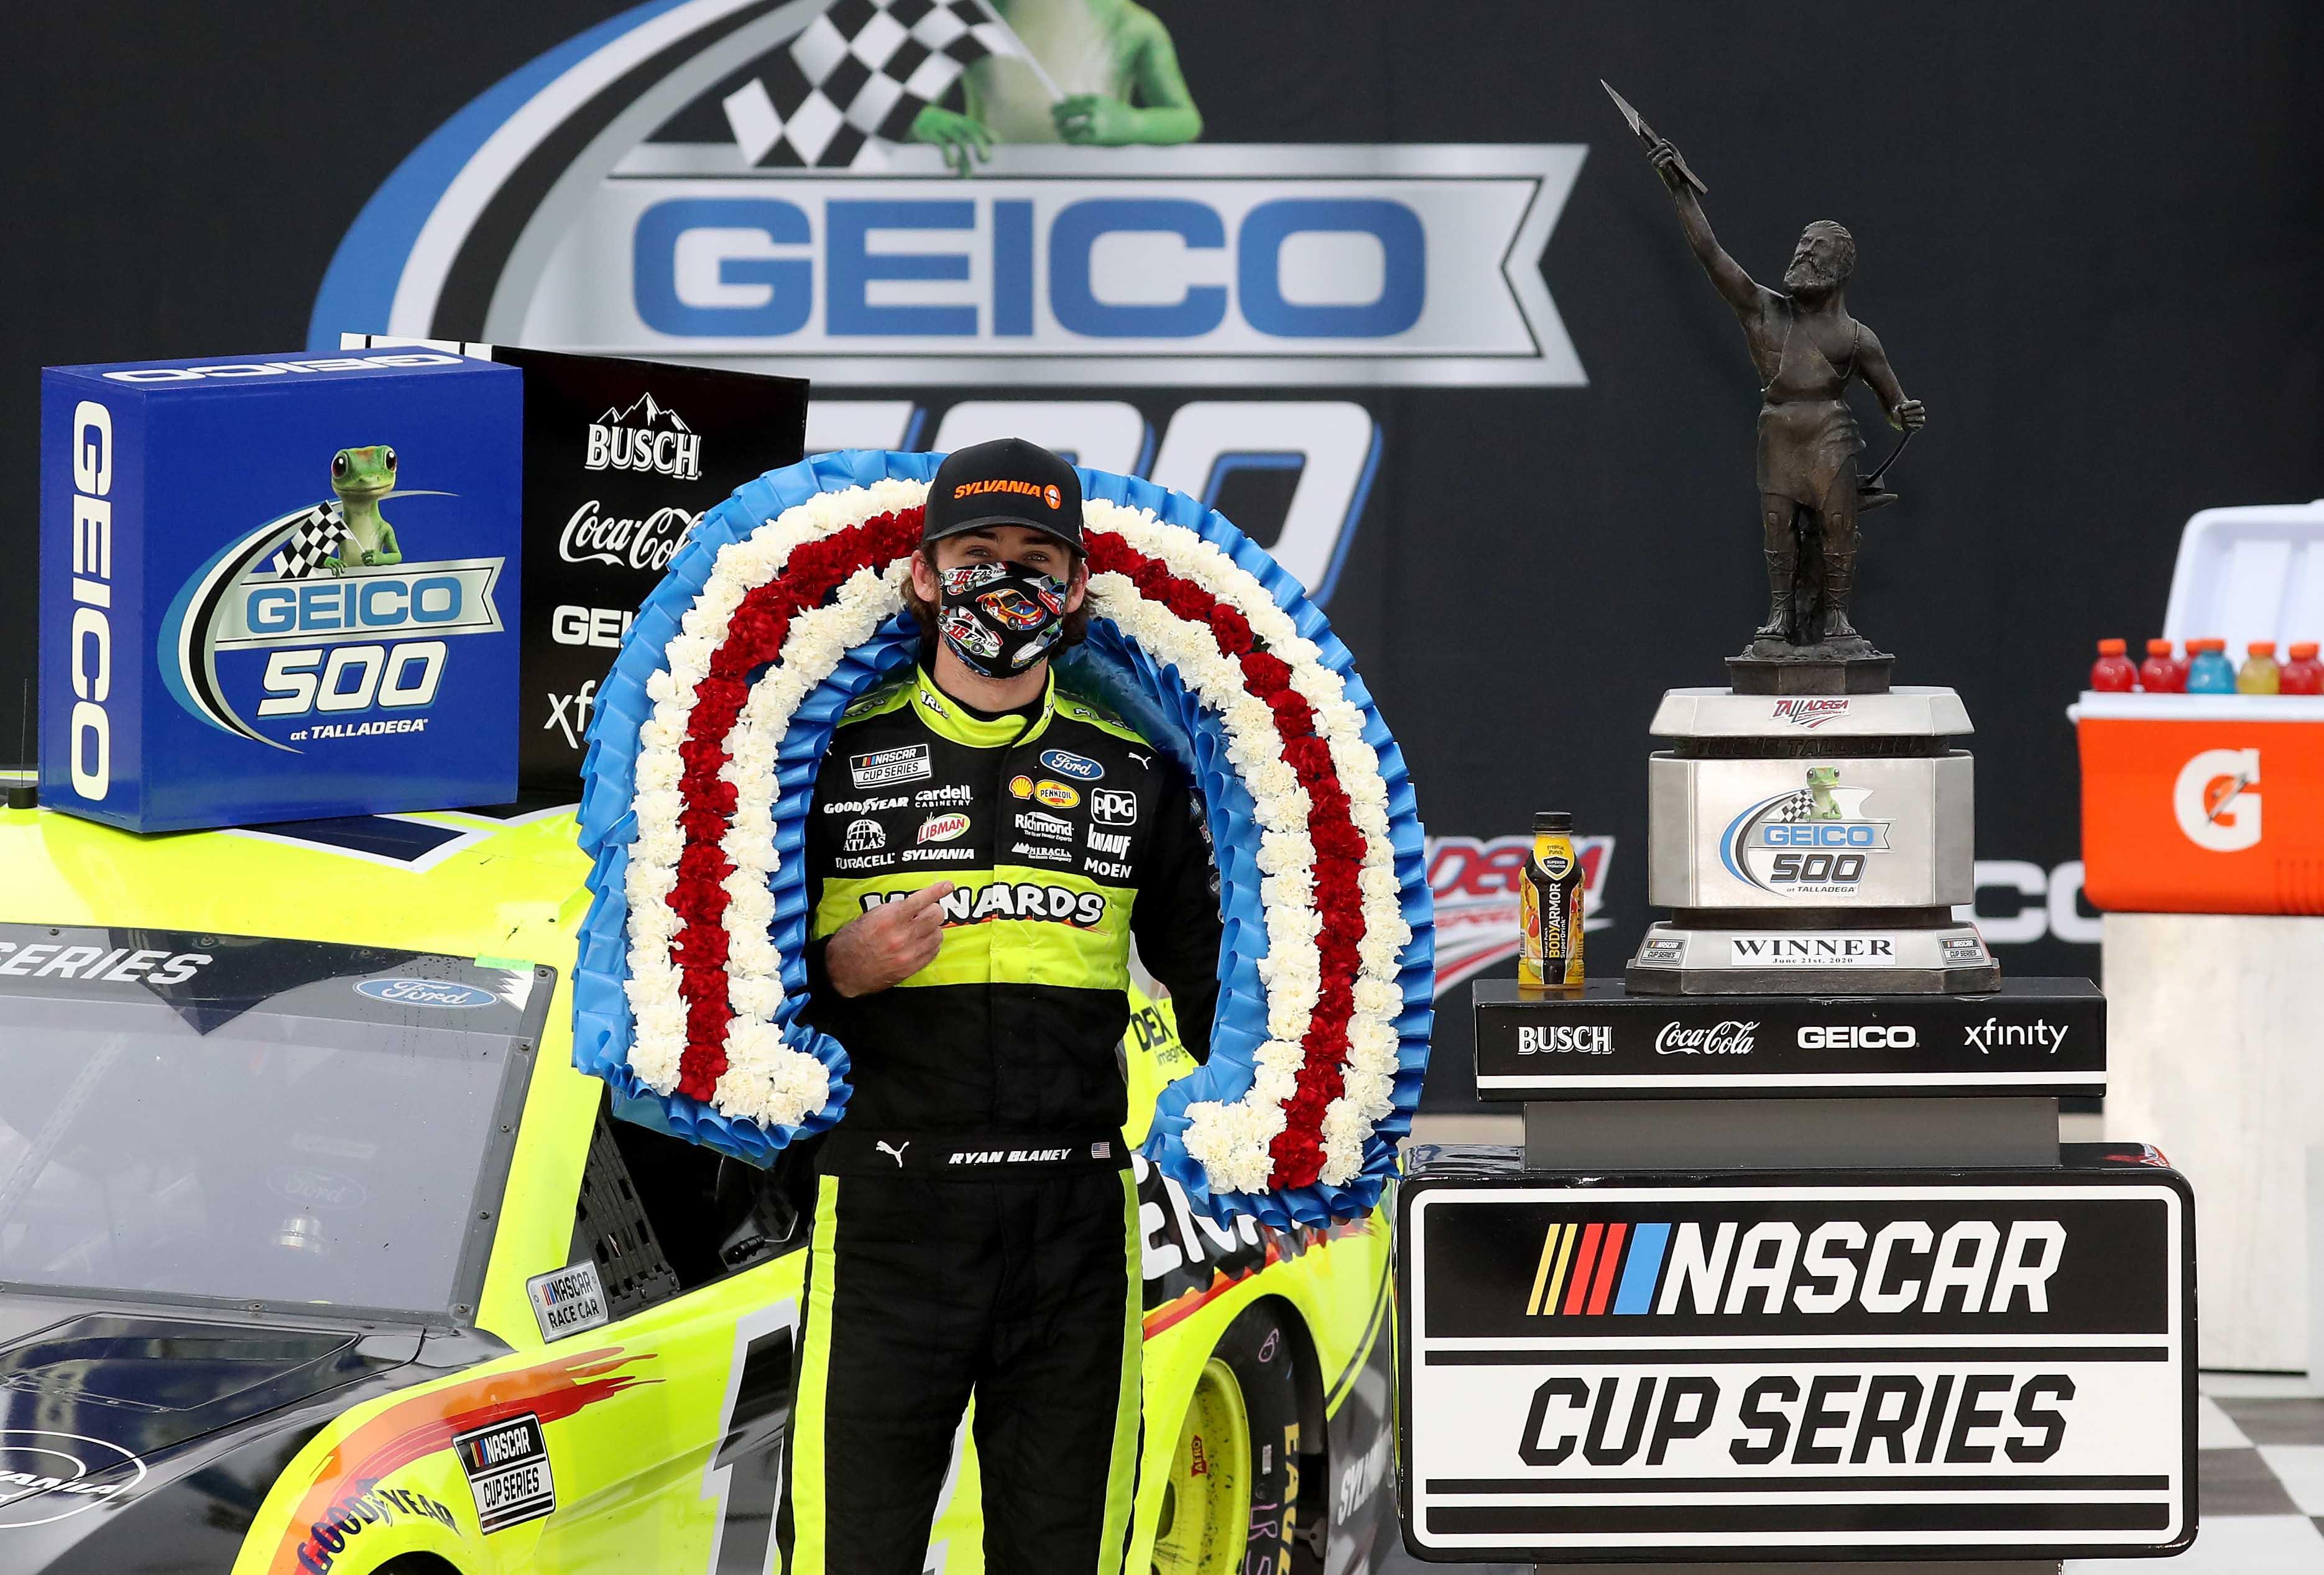 Ryan Blaney in victory lane at Talladega Superspeedway - NASCAR Cup Series